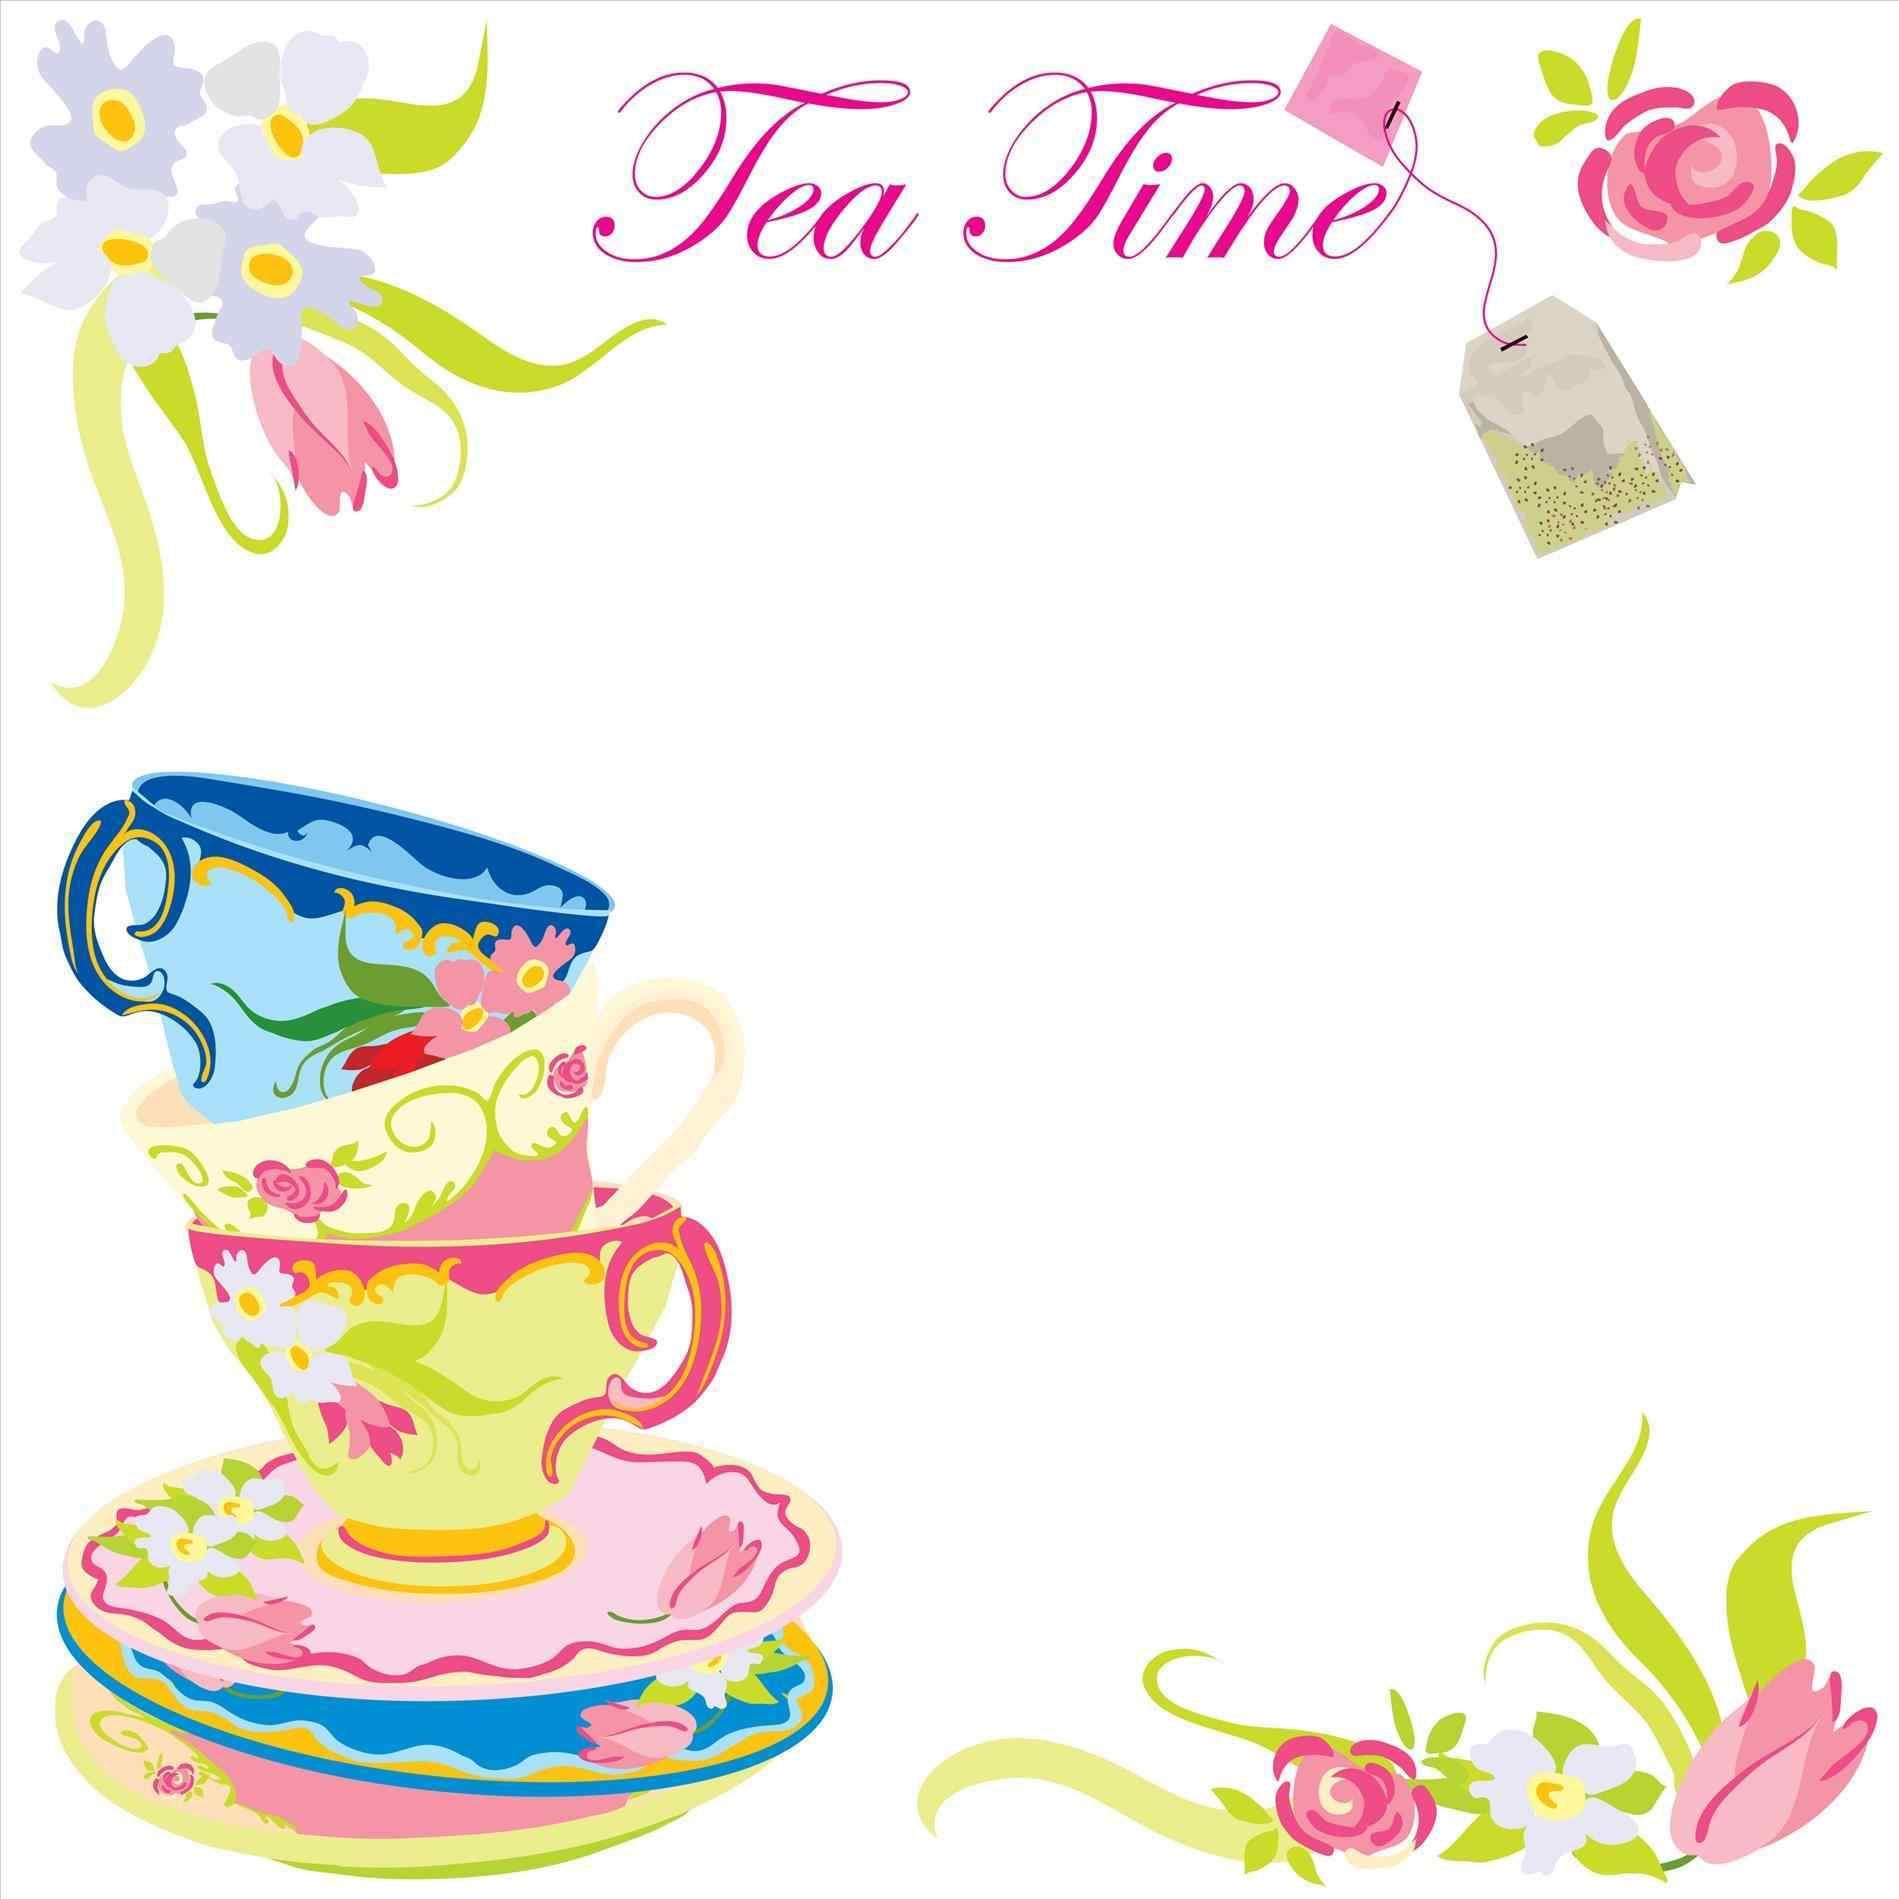 1899x1899 Prcess Alice Wonderland Tea Party Clip Art Pot Alice